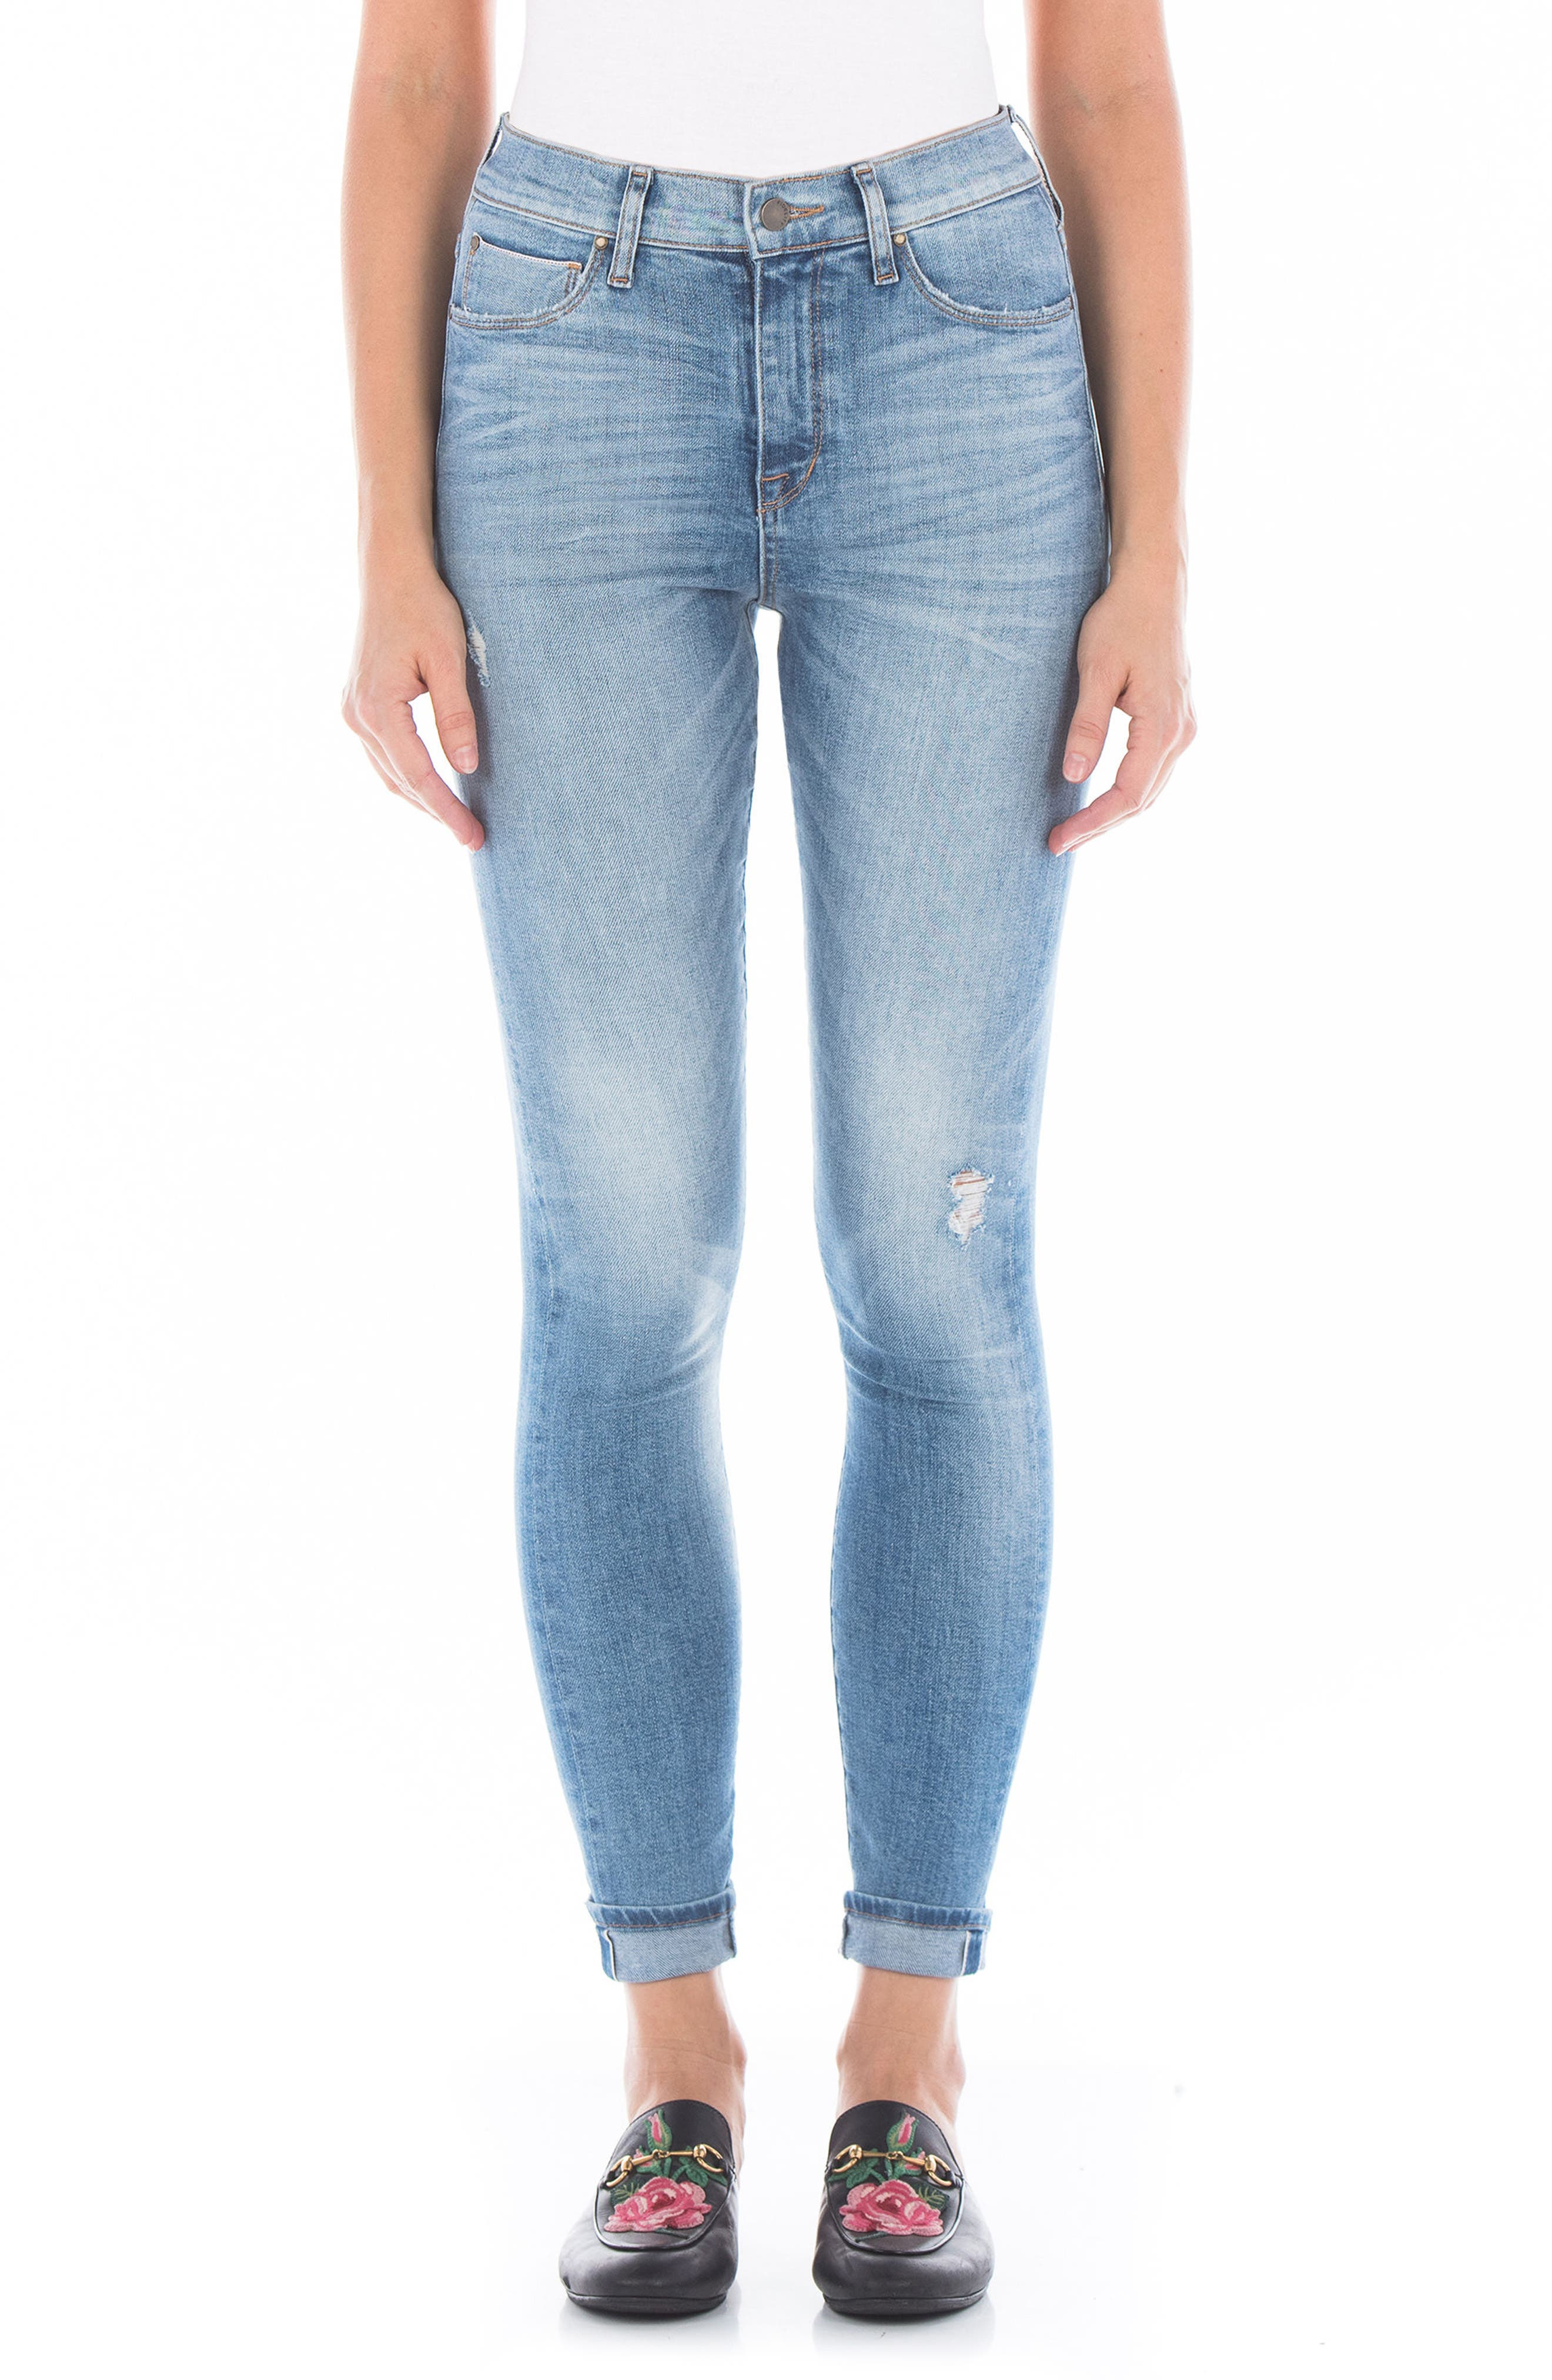 Fidelity Denim Gwen High Waist Skinny Jeans (76 Summer)